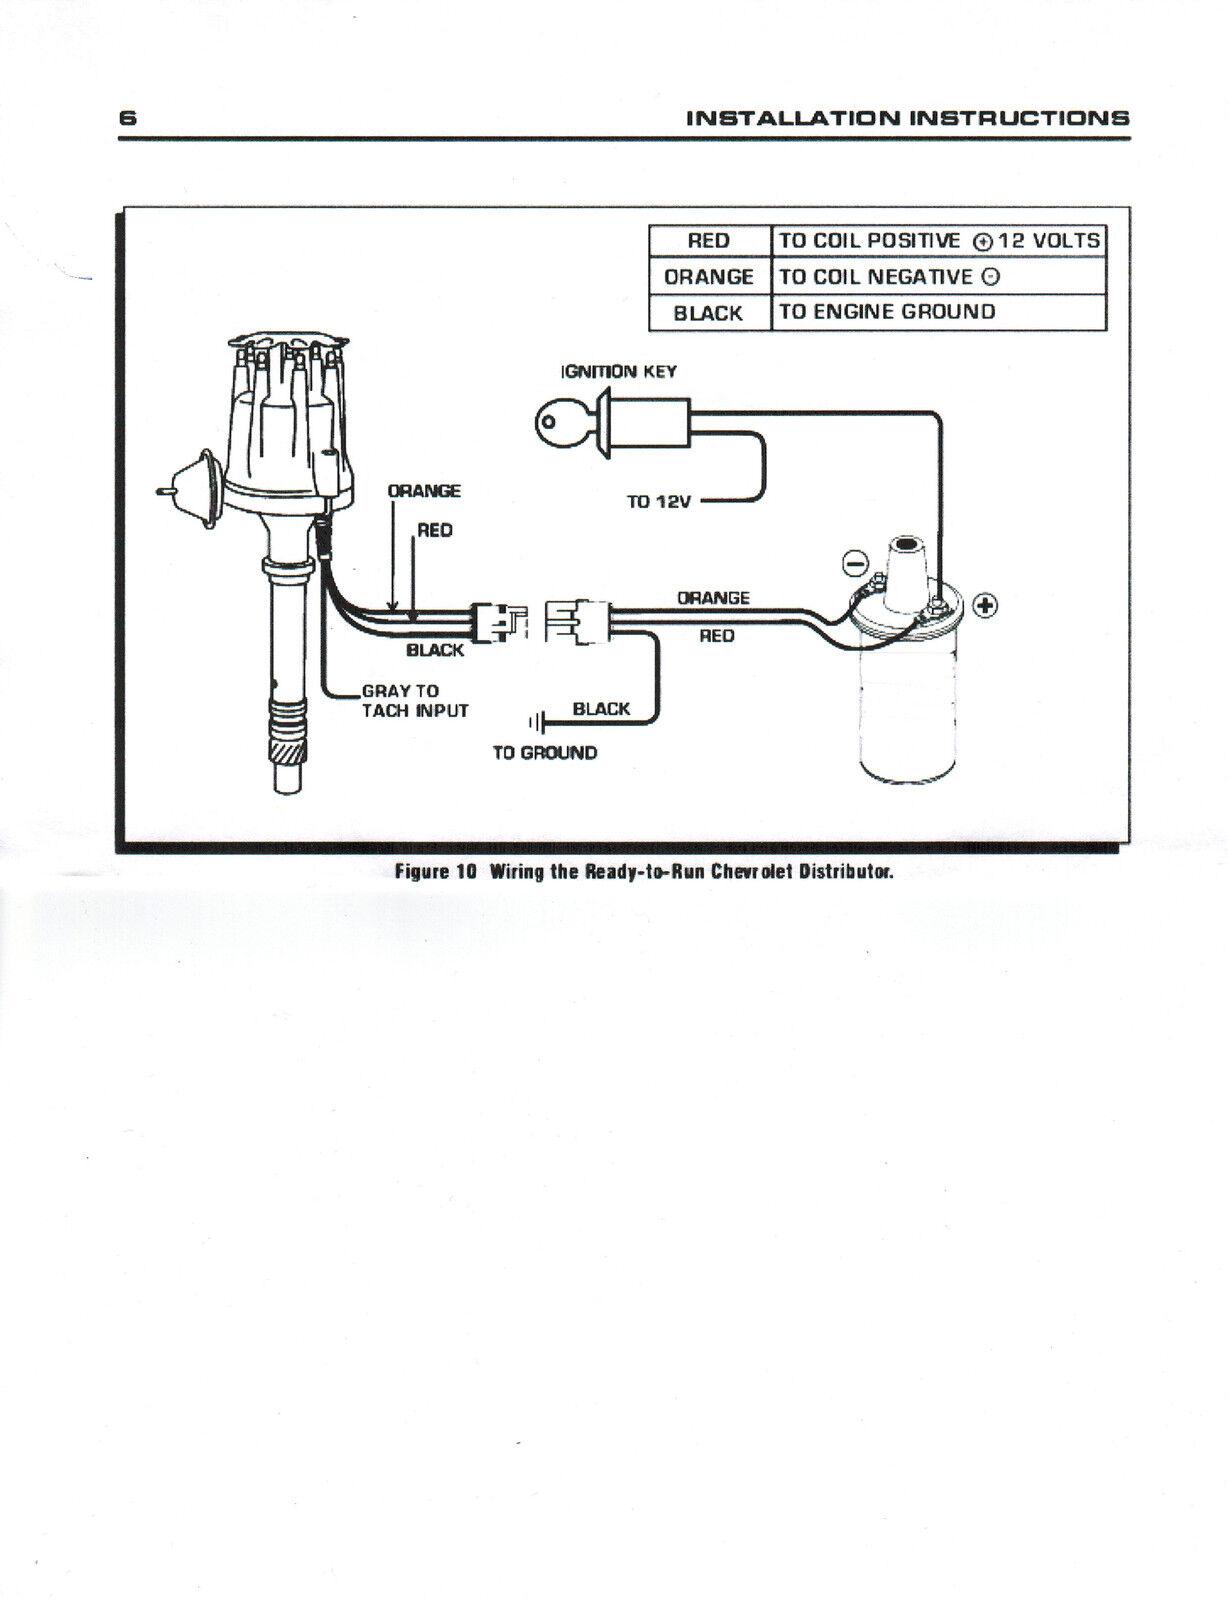 gm small cap hei wiring enthusiast wiring diagrams u2022 rh bwpartnersautos com